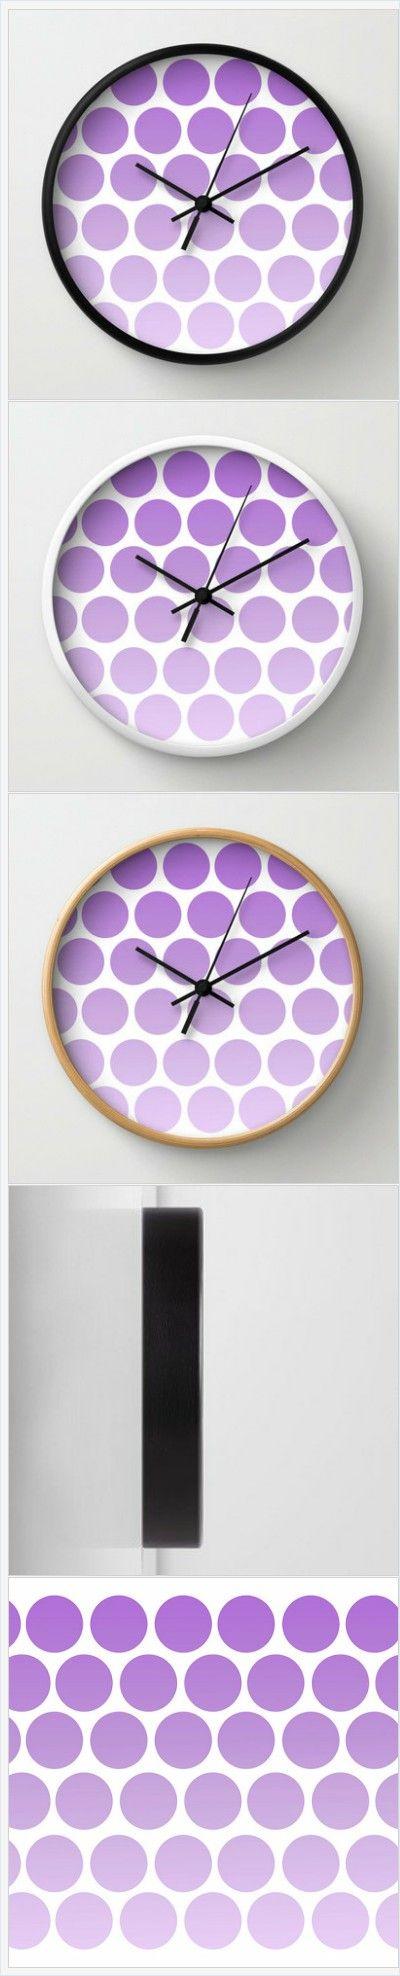 Purple Polka Dot Clock - Wall Clock - Polka Dots - Purple Clock - Choice of Frame Color - Made to Order